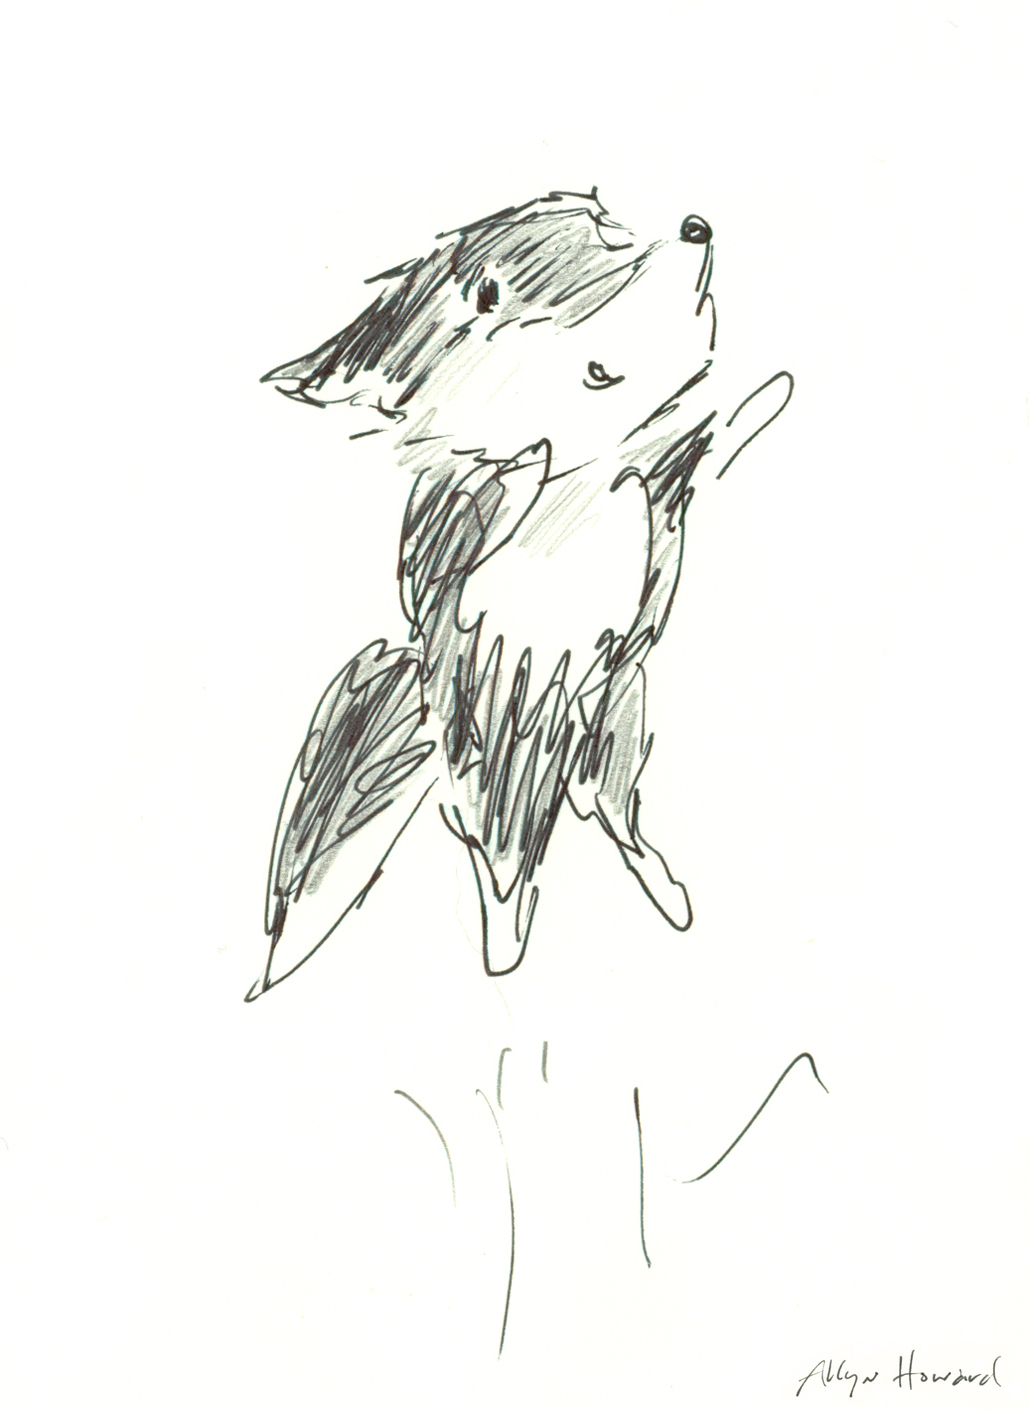 Fox Leaps_AllynHoward.jpg